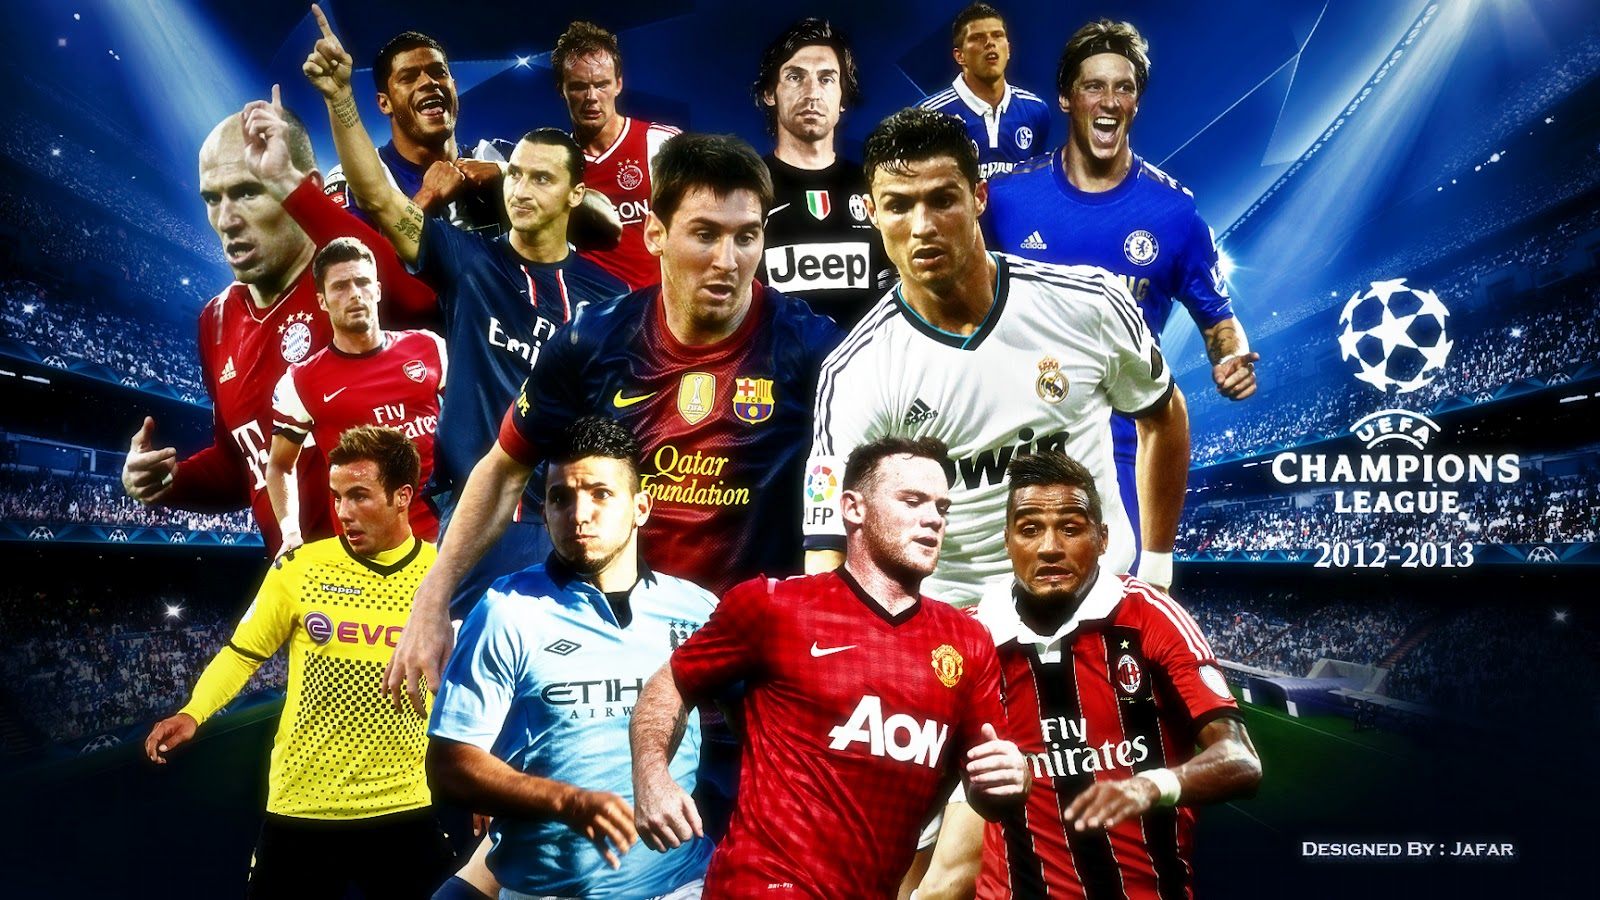 Jadwal Liga Champions: Jadwal Pertandingan 16 Besar Liga Champions Eropa 2013